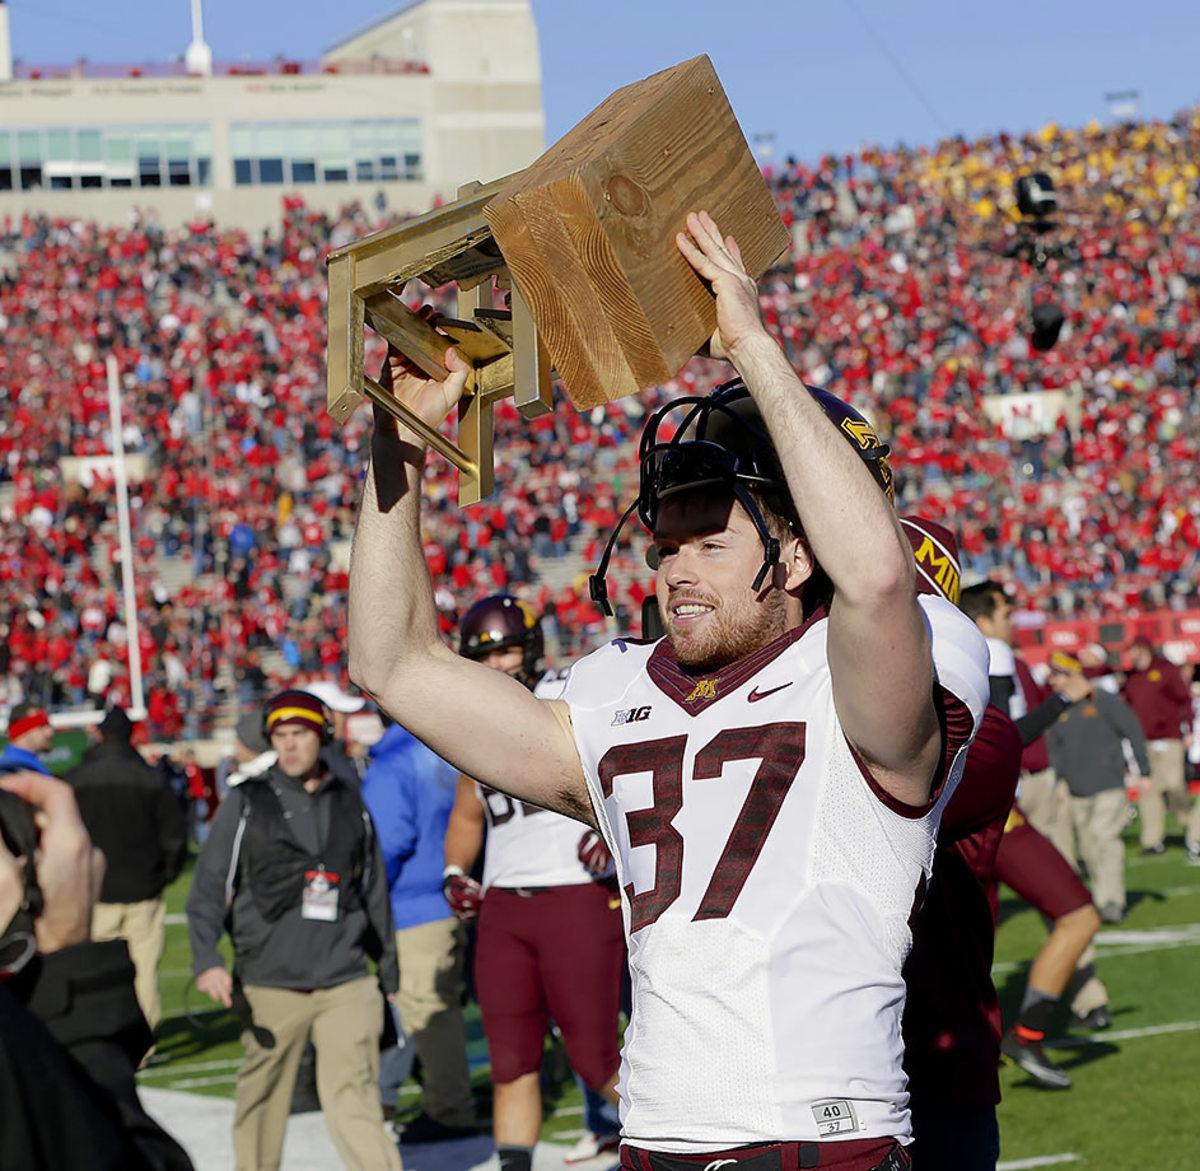 Bits-of-Broken-Chair-Trophy-Minnesota-Nebraska-Peter-Mortell.jpg